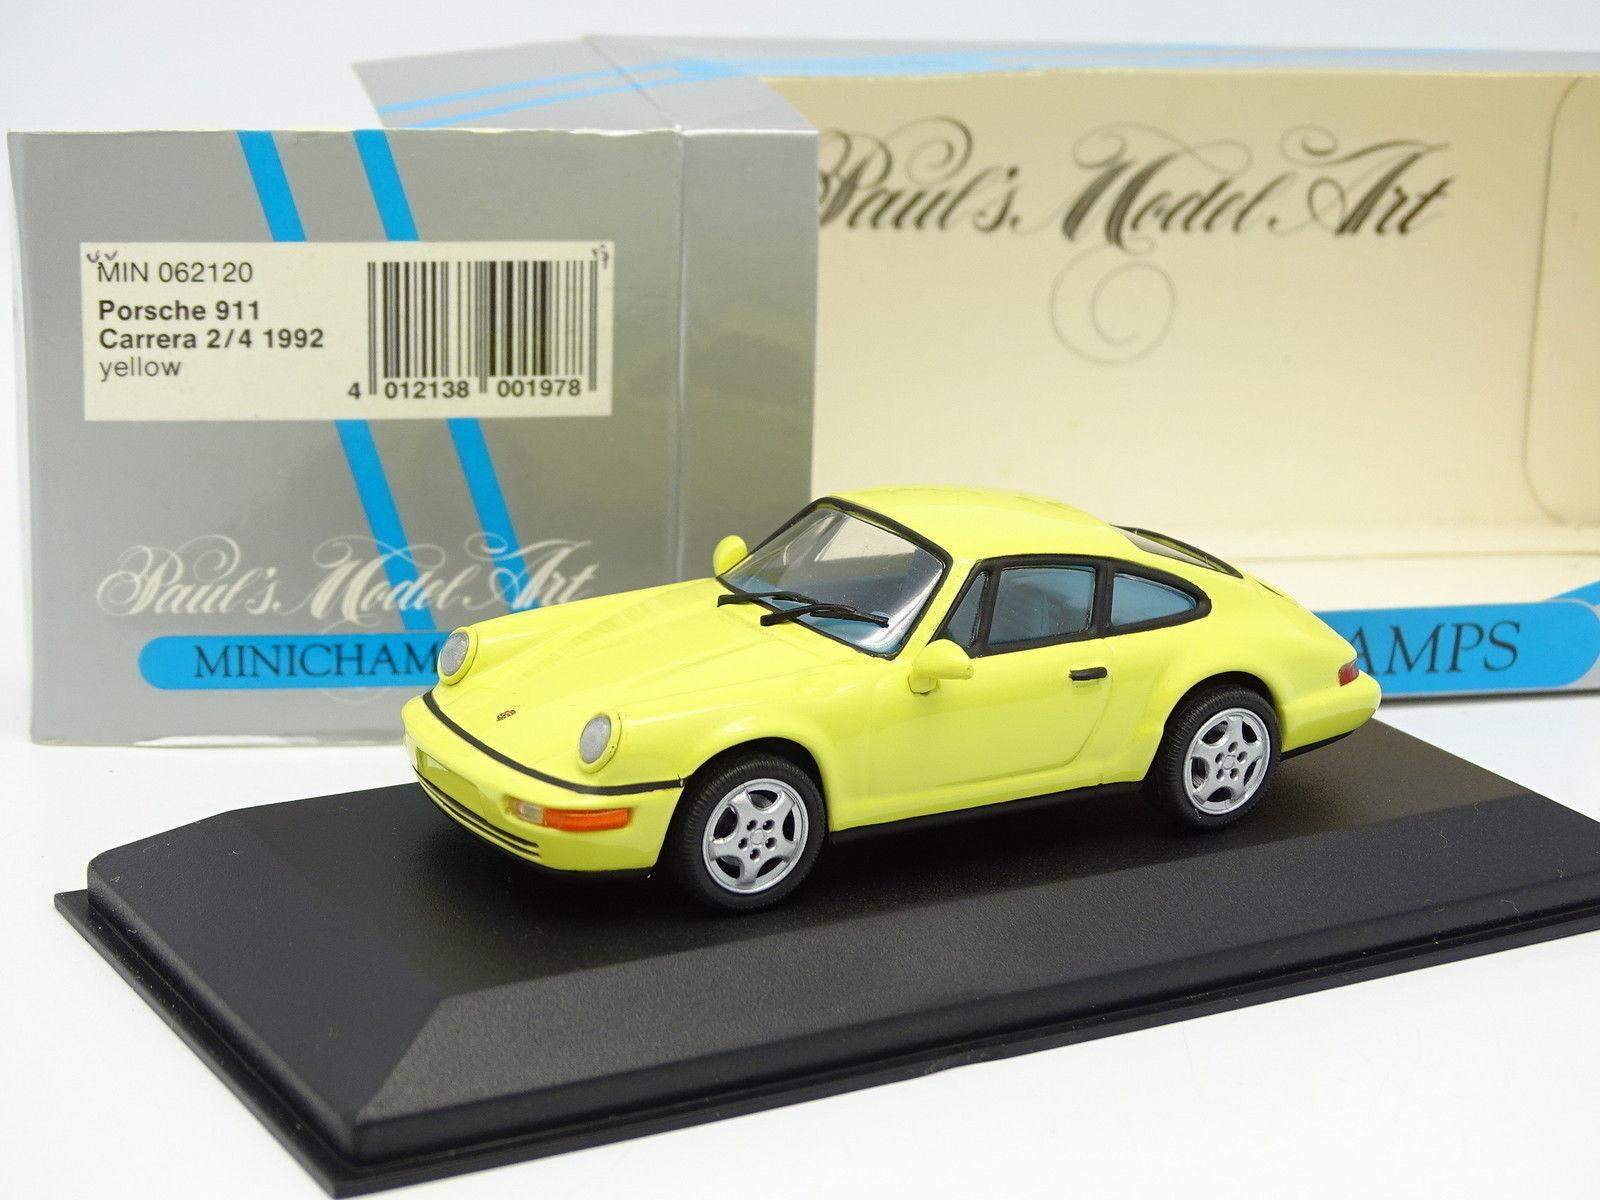 Minichamps 1 43 - Porsche 911 964 Carrera 2 4 1992 Amarillo